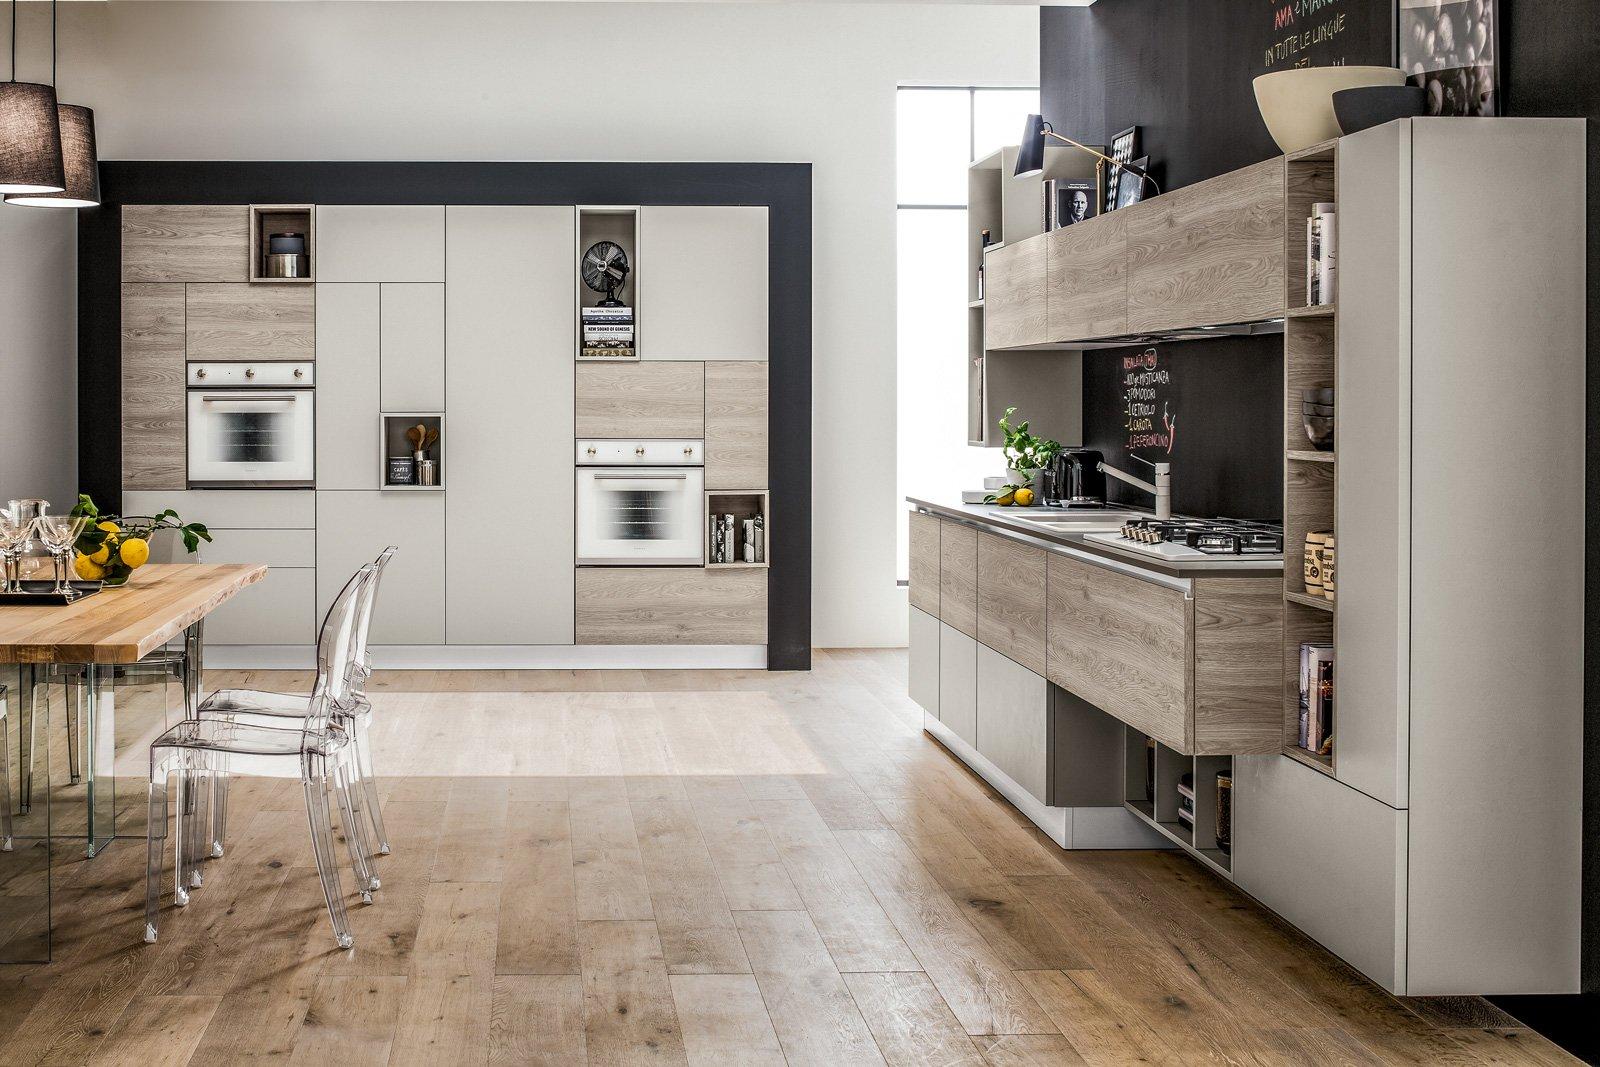 Arredamento cucine piccole cose di casa - Arrex cucine moderne ...